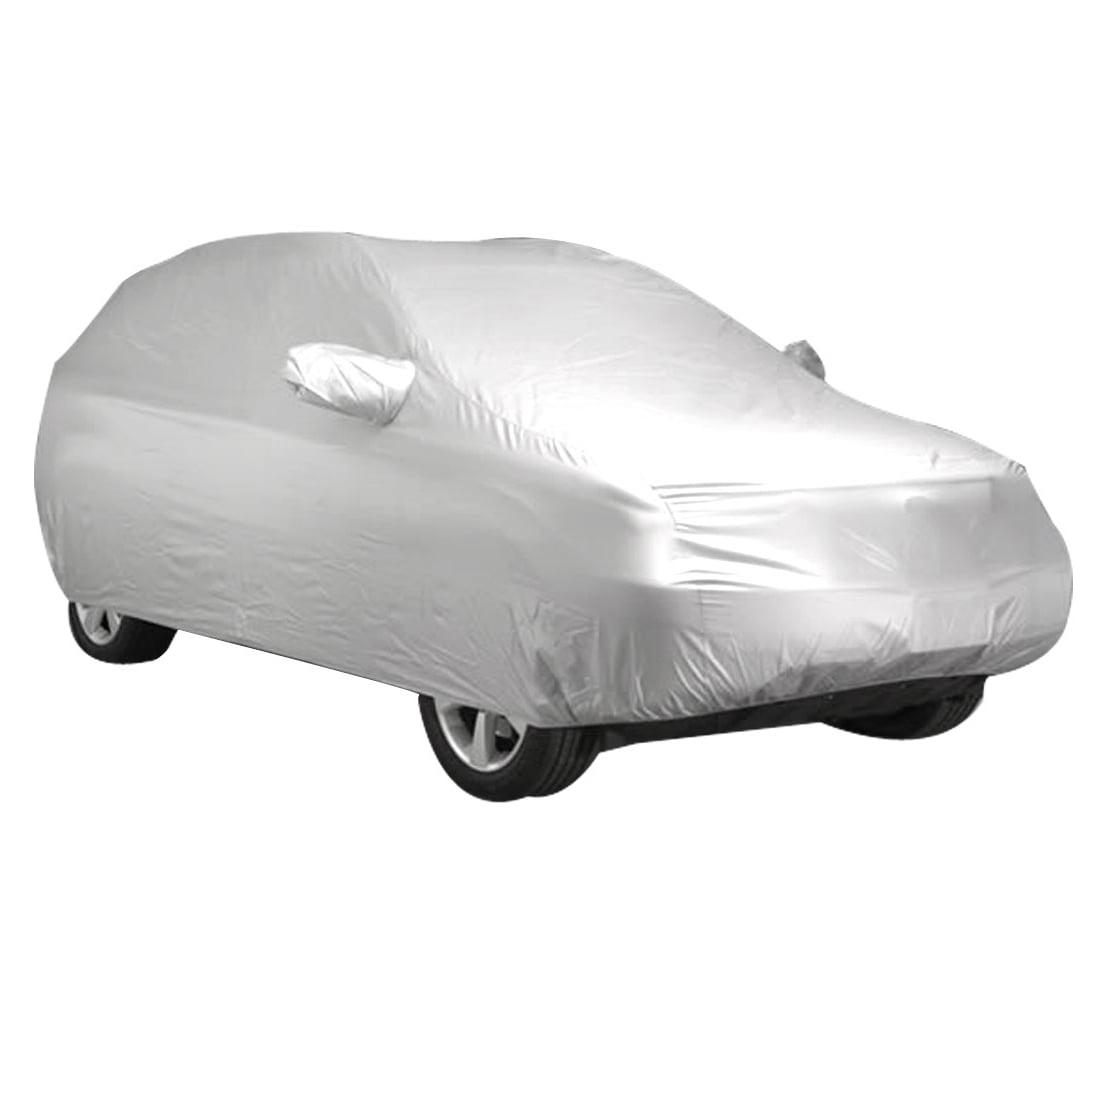 All Season UV Snow Protective Durable SUV Car Cover Outdoor for Nissan